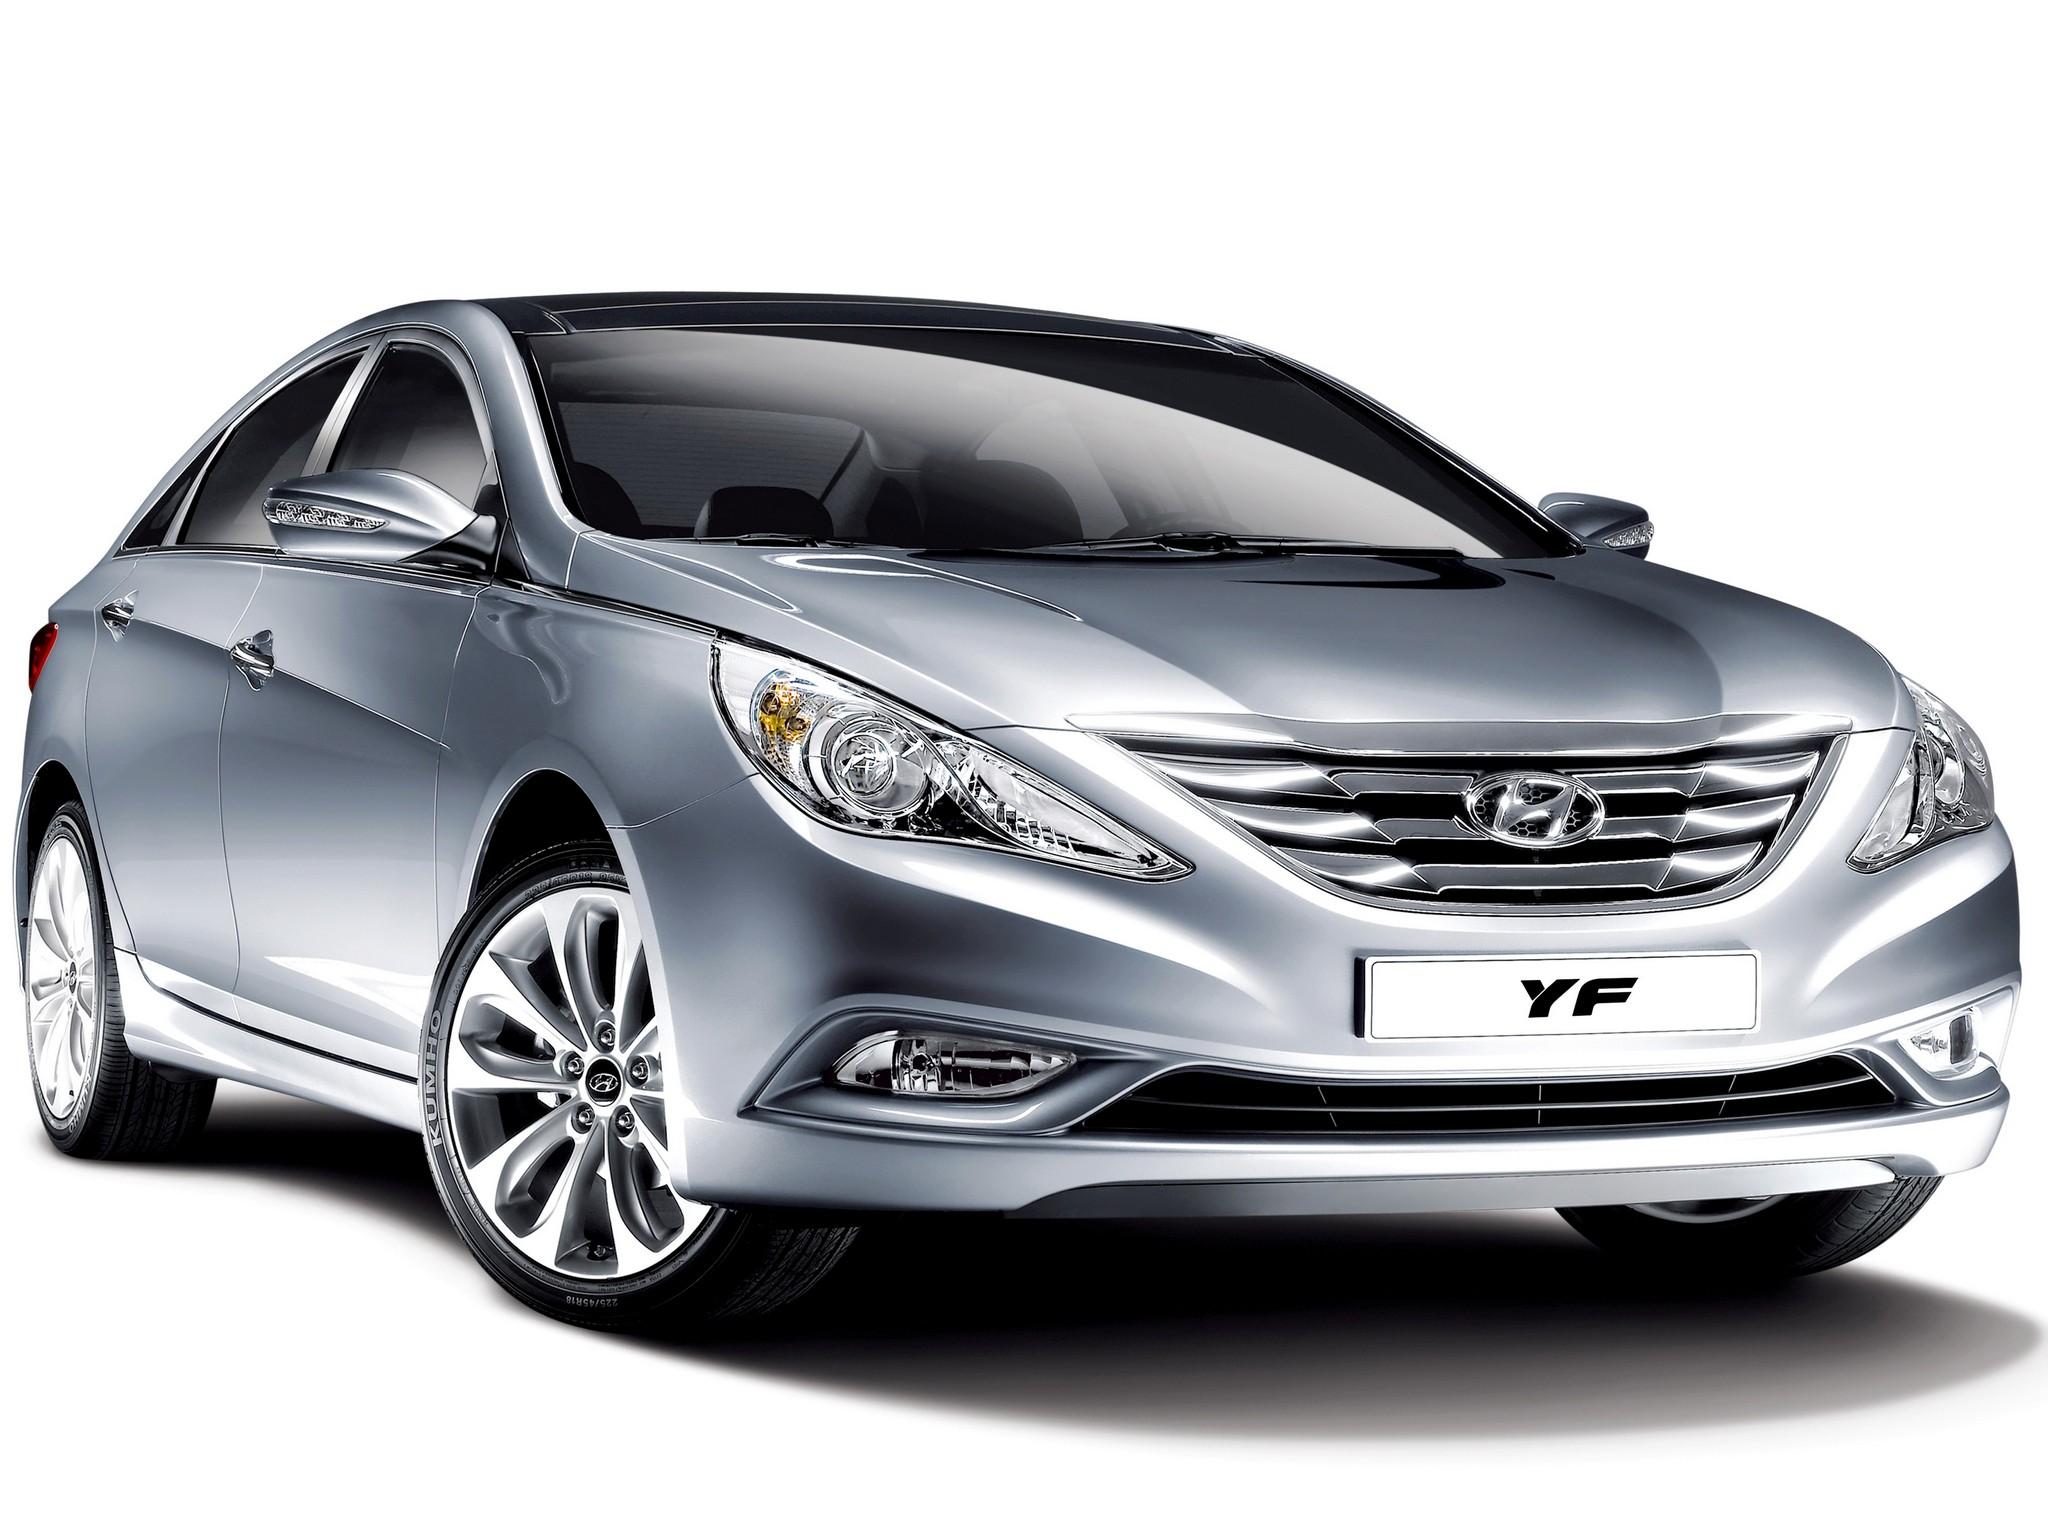 sonata hyundai 2009 i45 yf autoevolution cars